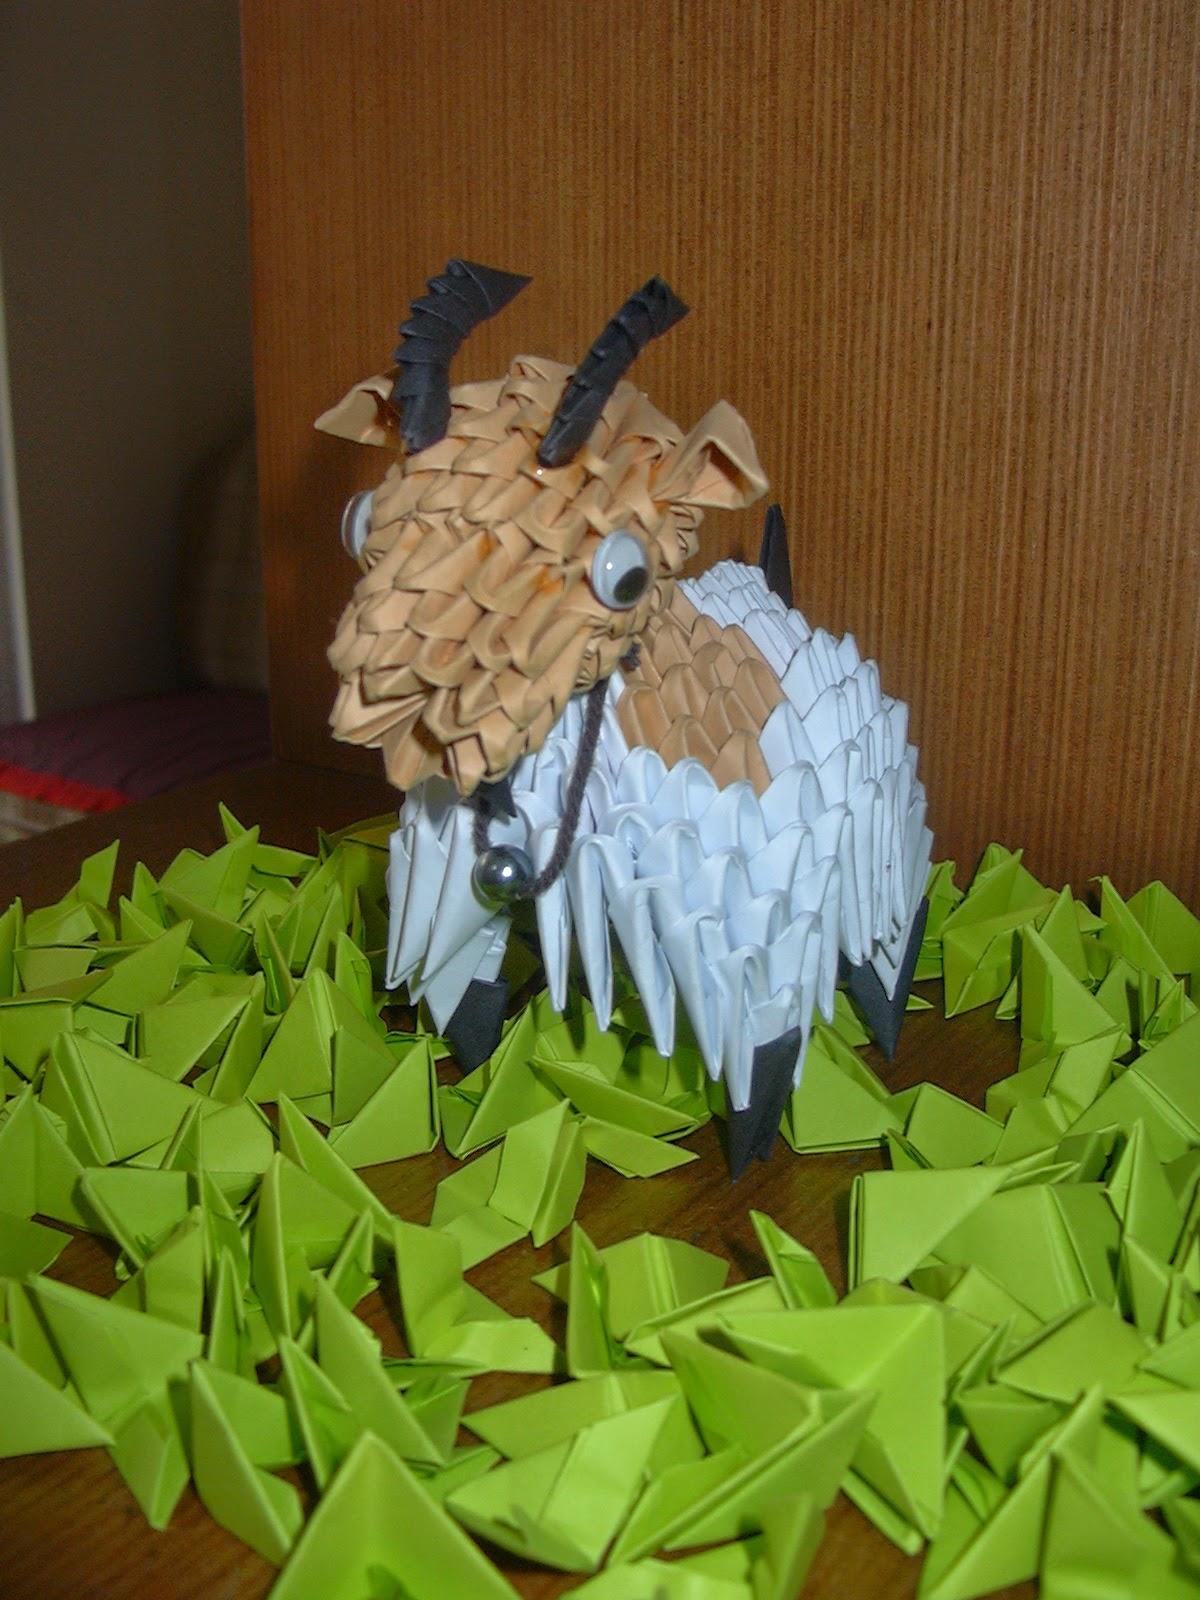 ICHANOKO 3D ORIGAMI INDONESIA: Model 3d origami - ANIMALS - photo#7